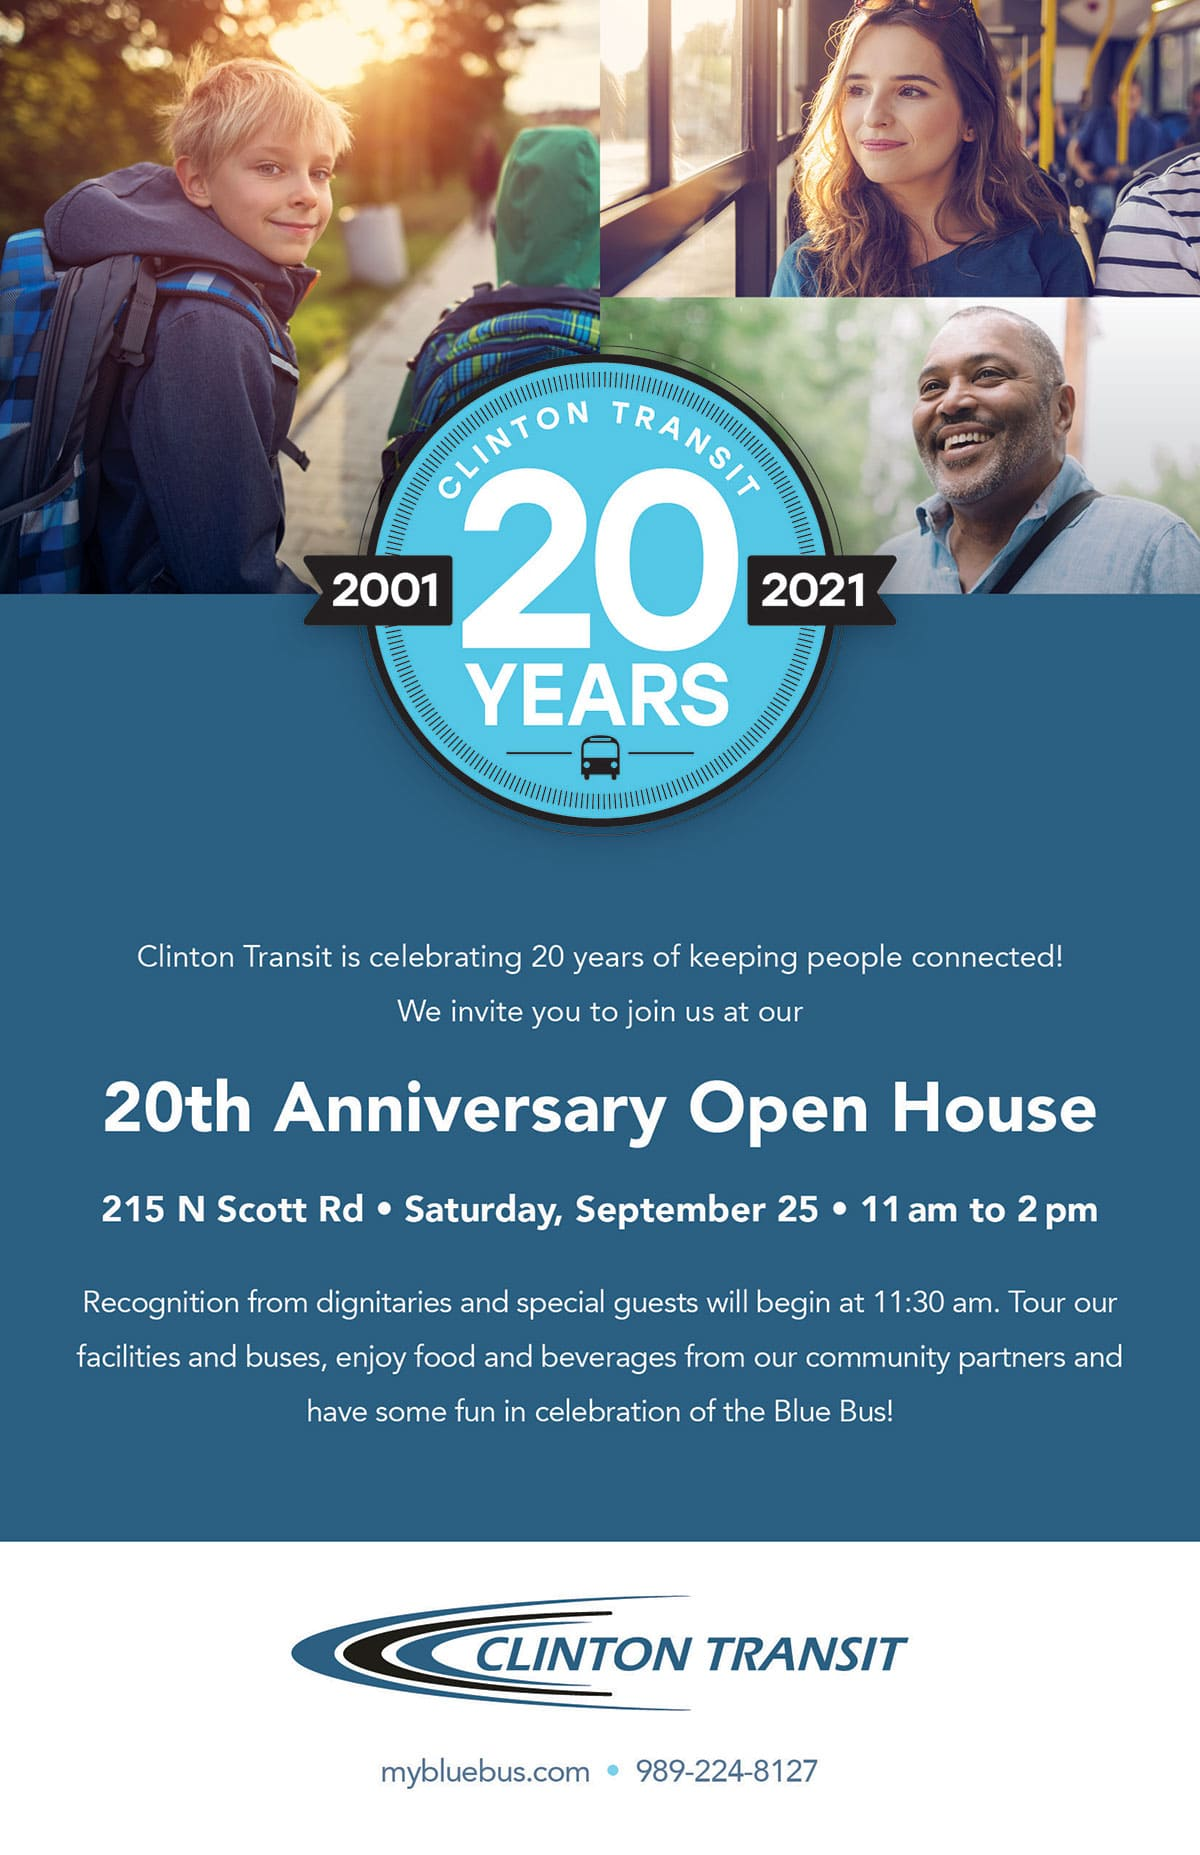 clinton transit 20th Anniversary